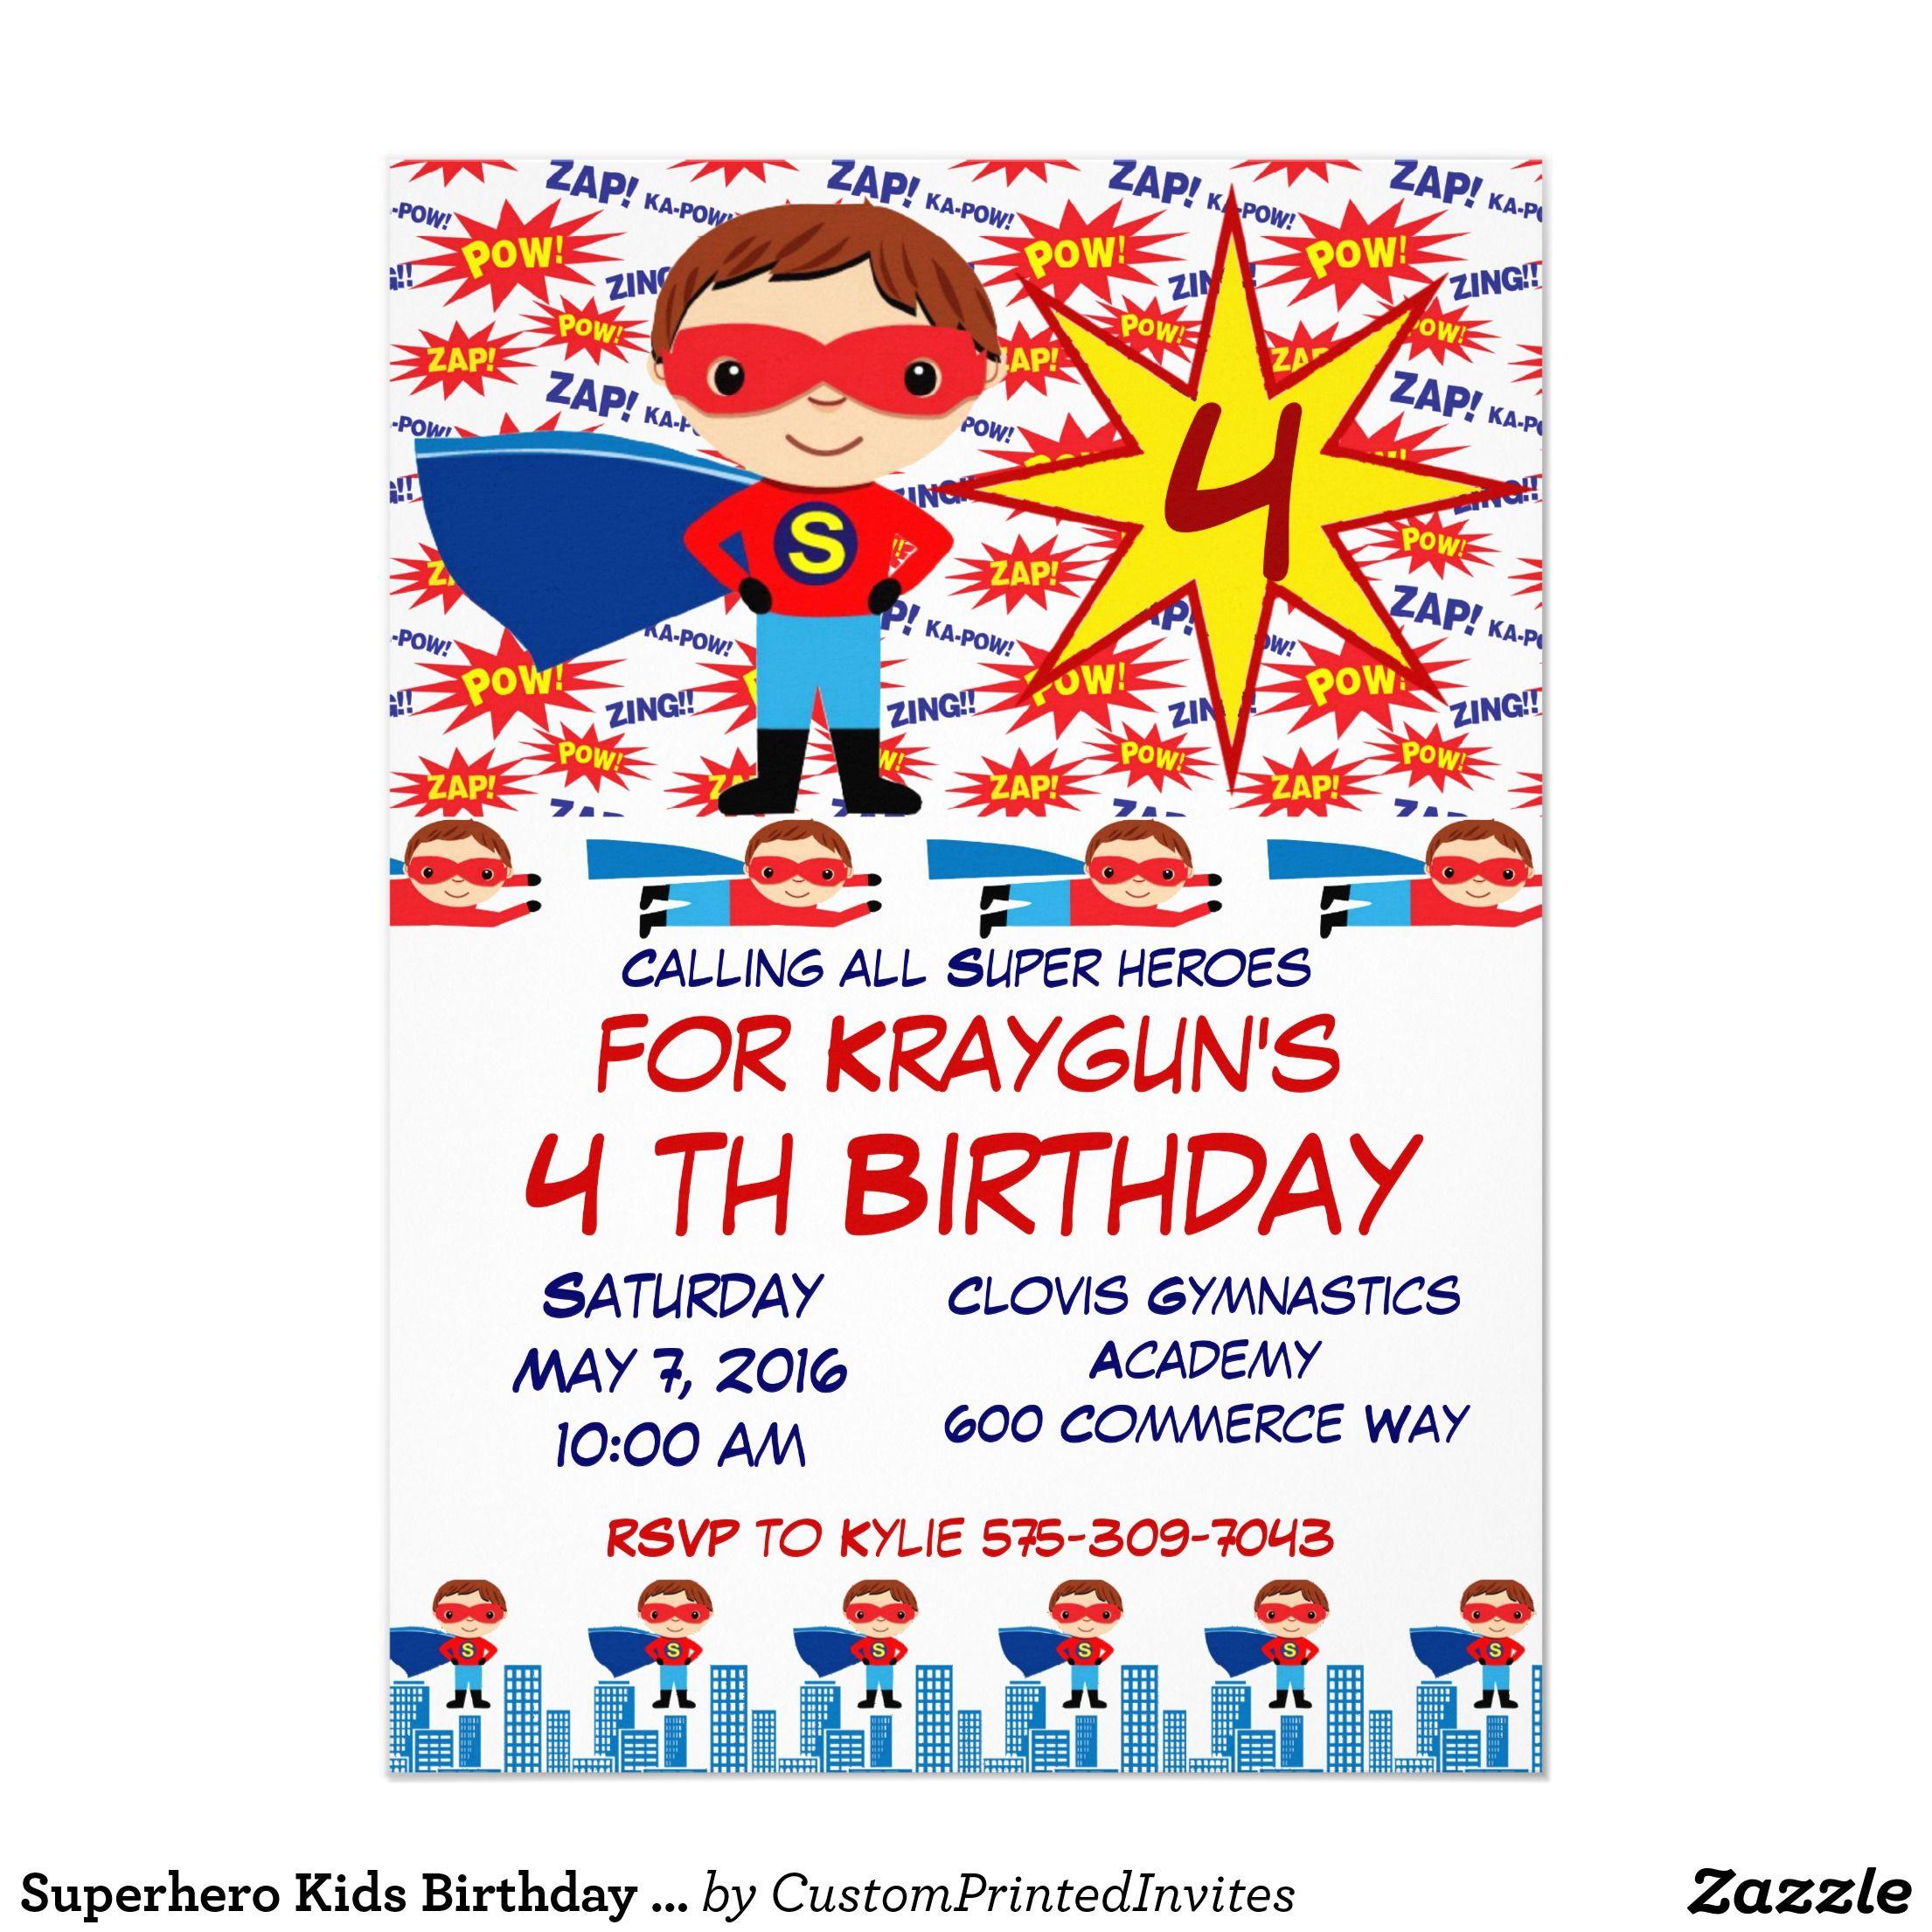 Superhero Kids Birthday Party Invitations For Boys Zazzle Com Kids Birthday Party Invitations Kids Birthday Birthday Party Invitations